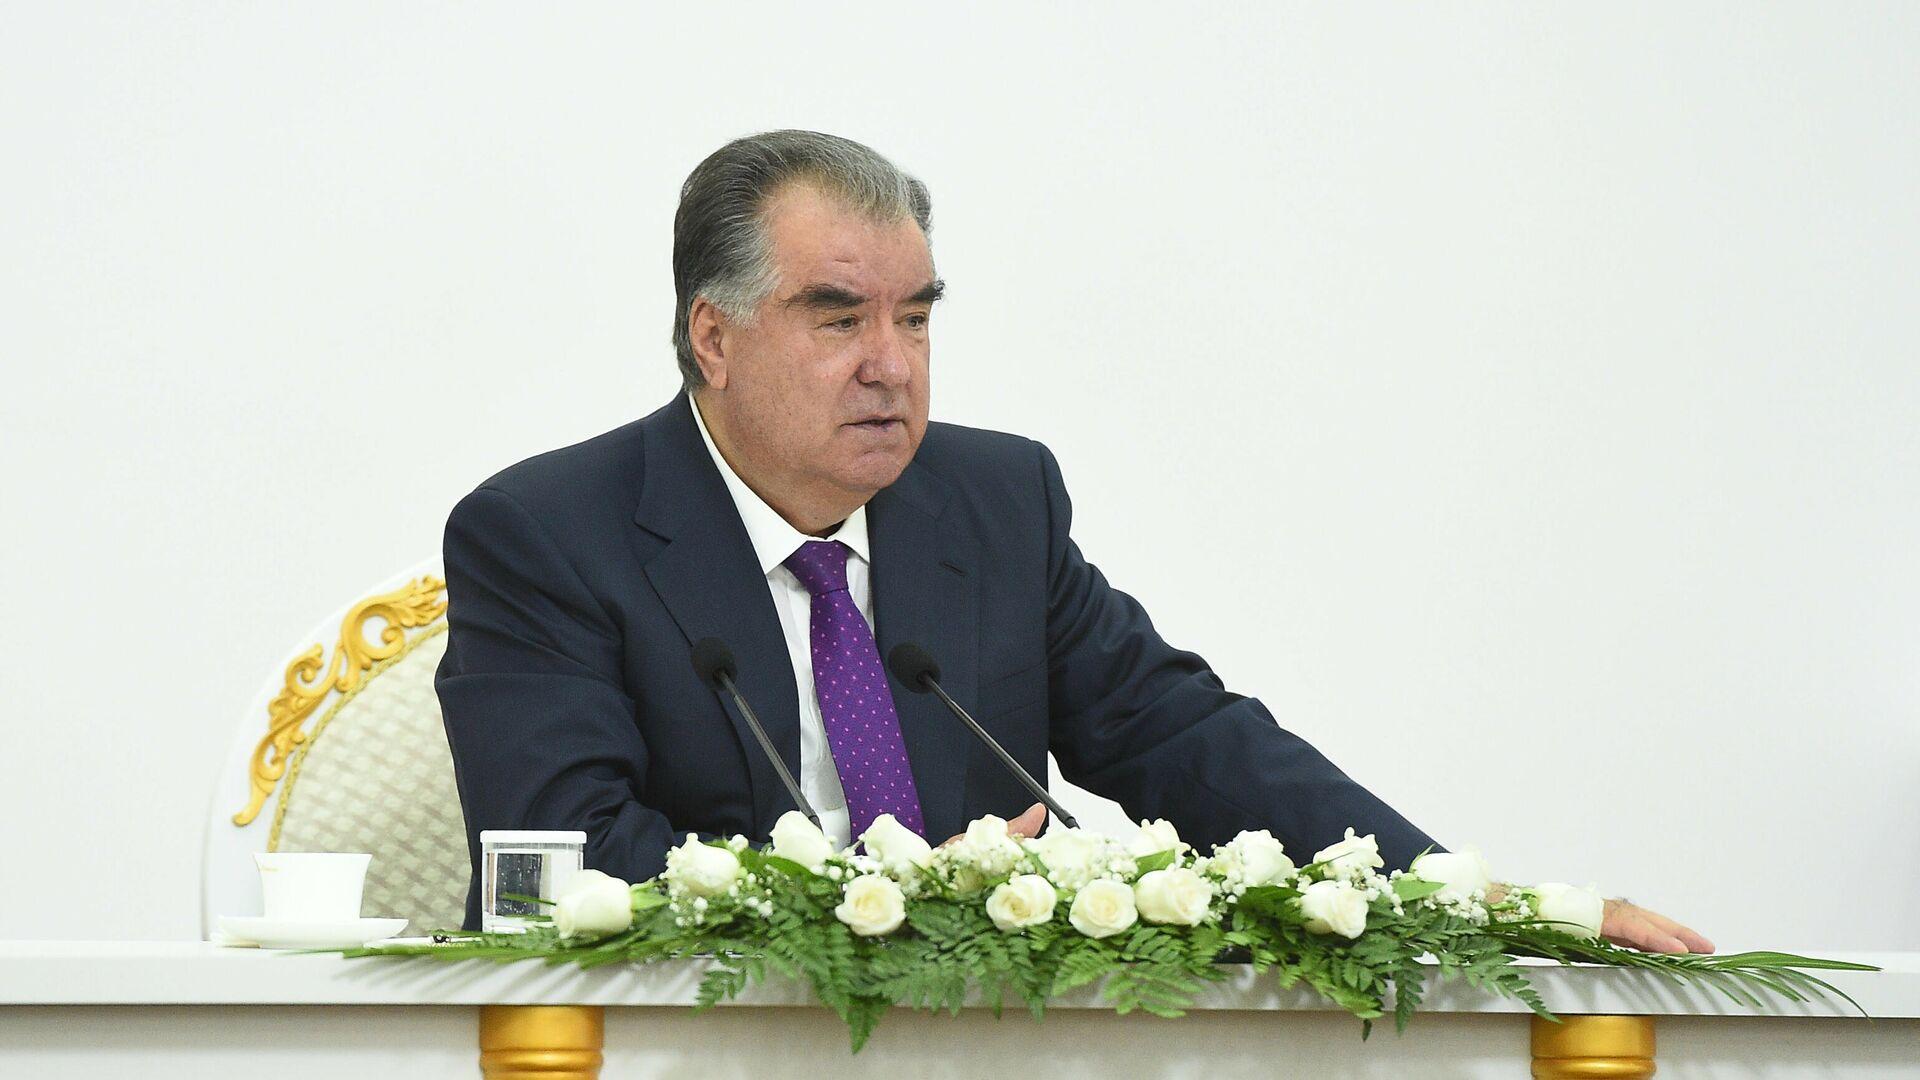 Президент Республики Таджикистан Эмомали Рахмон - Sputnik Тоҷикистон, 1920, 31.08.2021